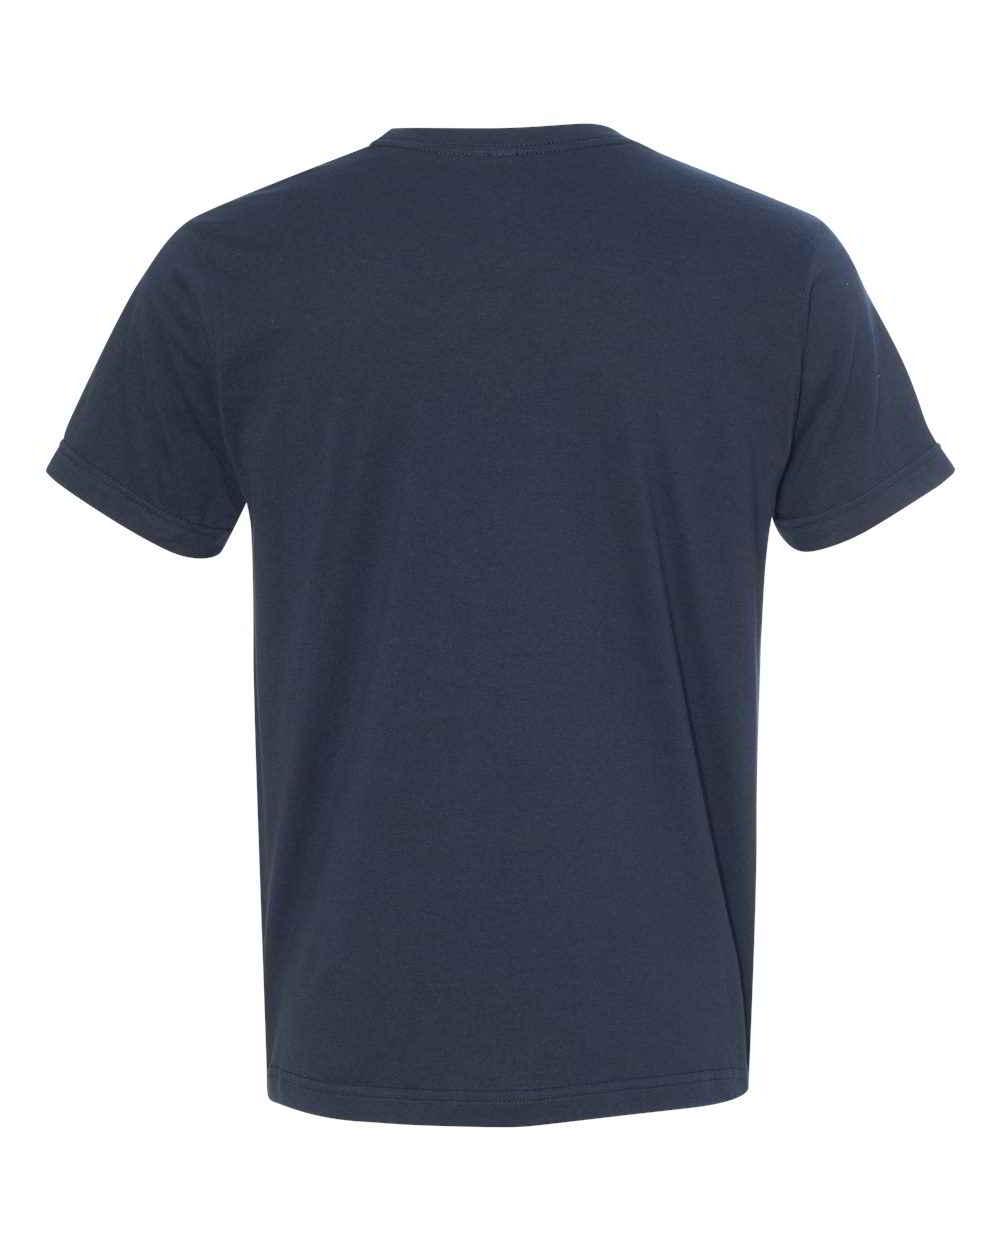 Gildan-Heavy-Cotton-Short-Sleeve-Mens-Blue-T-Shirts-5000 thumbnail 23